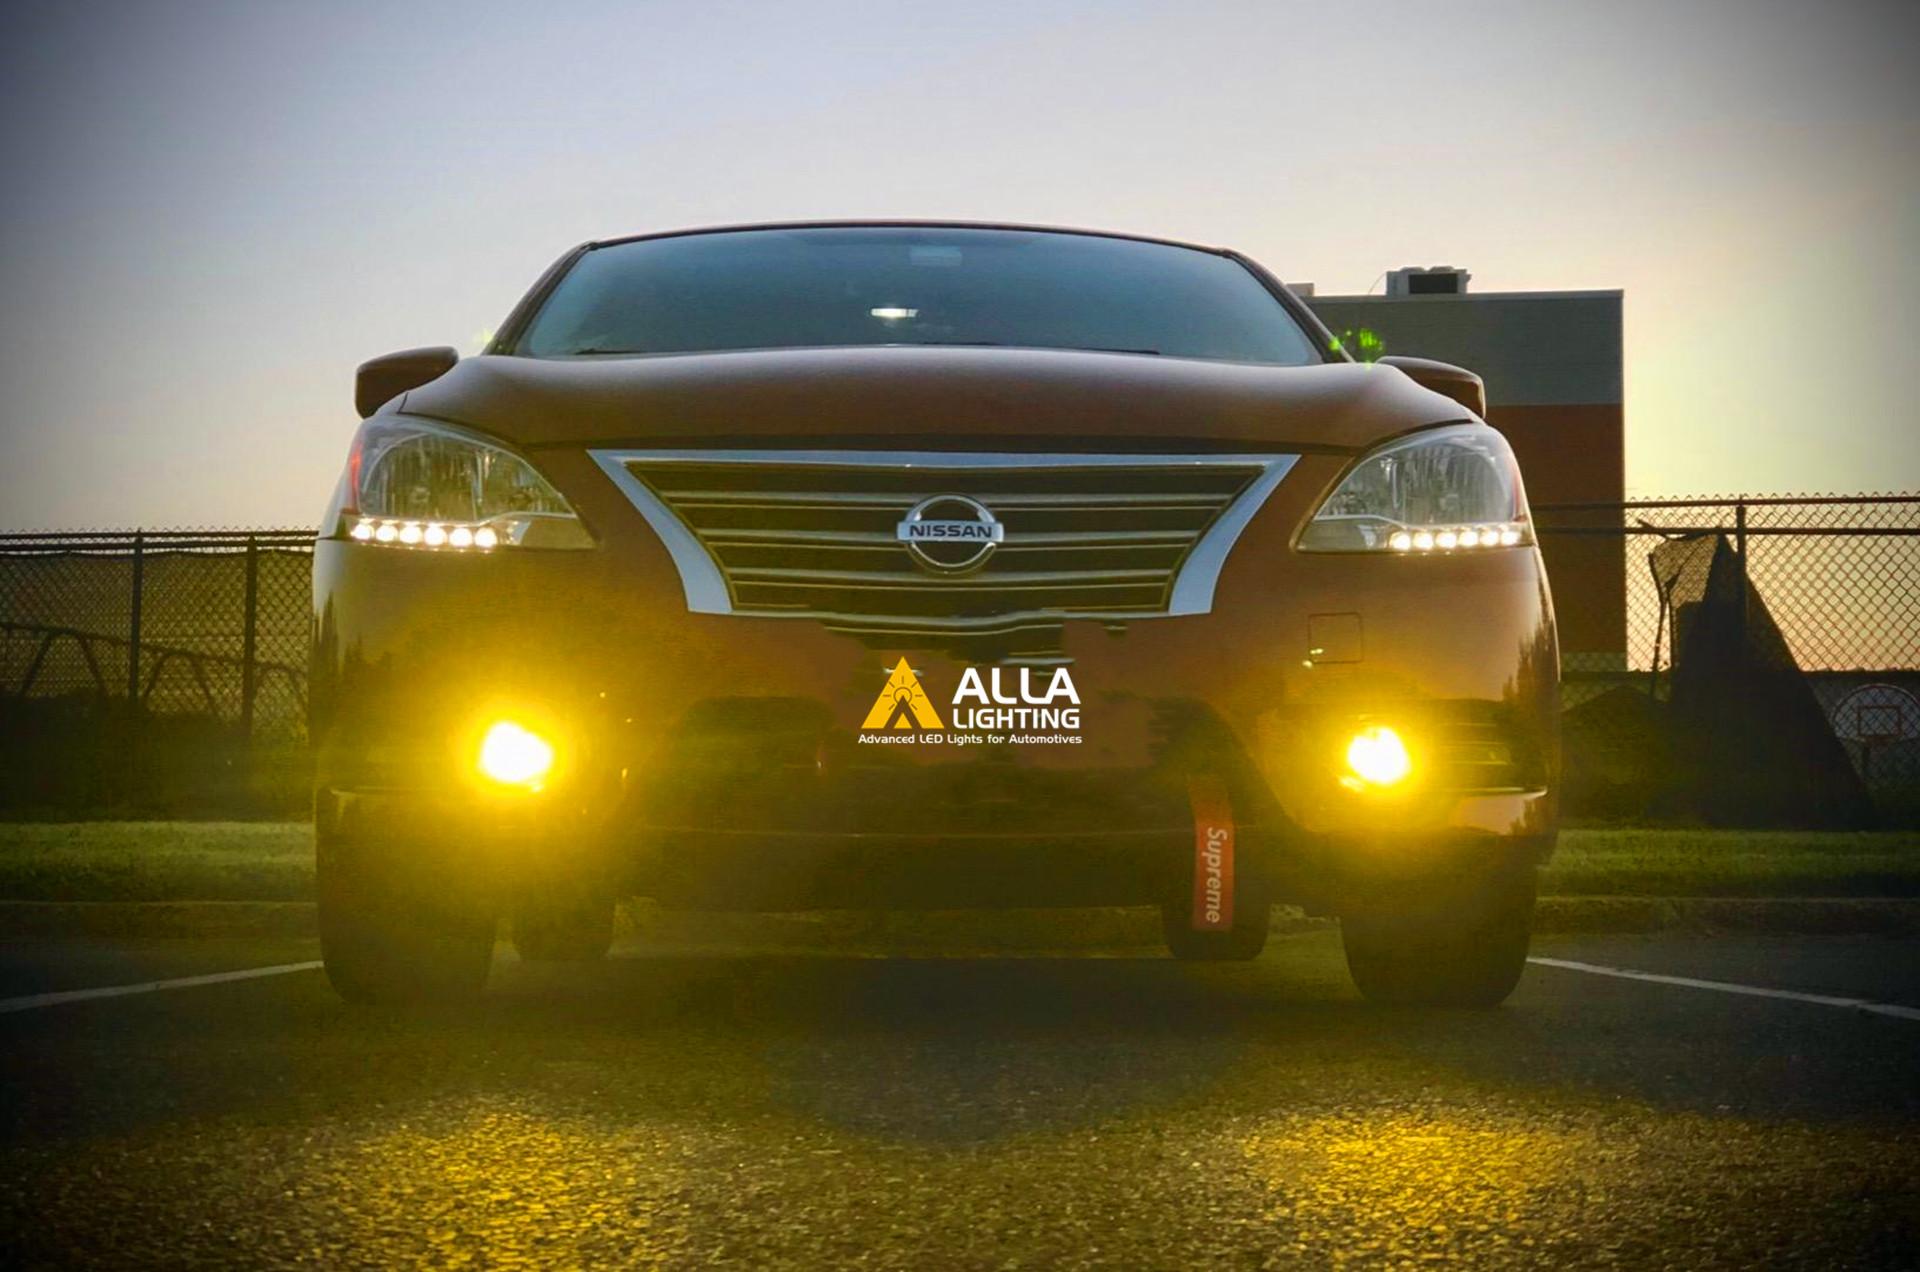 Nissan-Pathfinder-fog-lights-Bulbs-jdm-3000K-Yellow-H11-Replacement